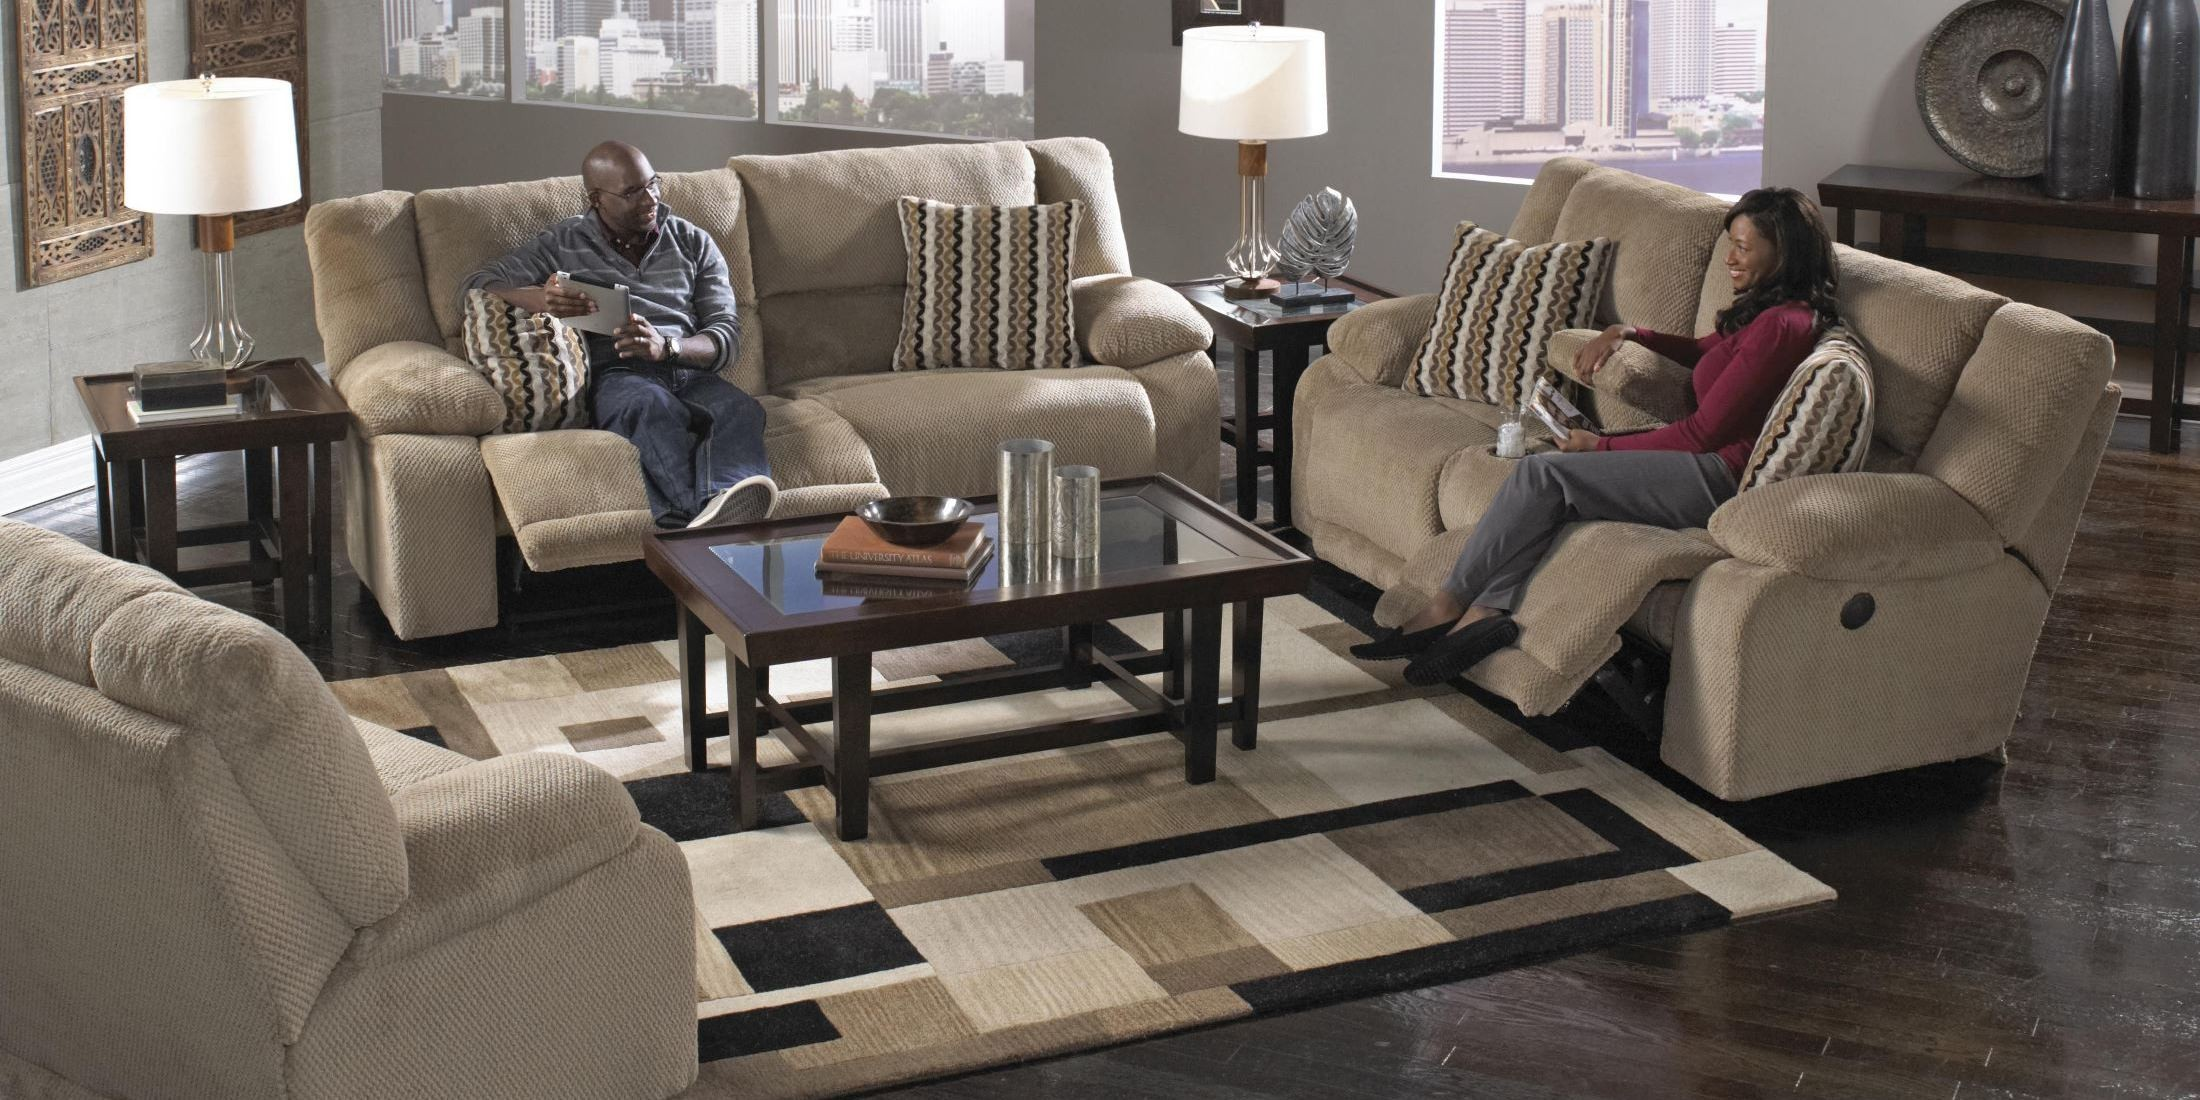 Hammond Coffee Reclining Living Room Set From Catnapper 1441280000000000